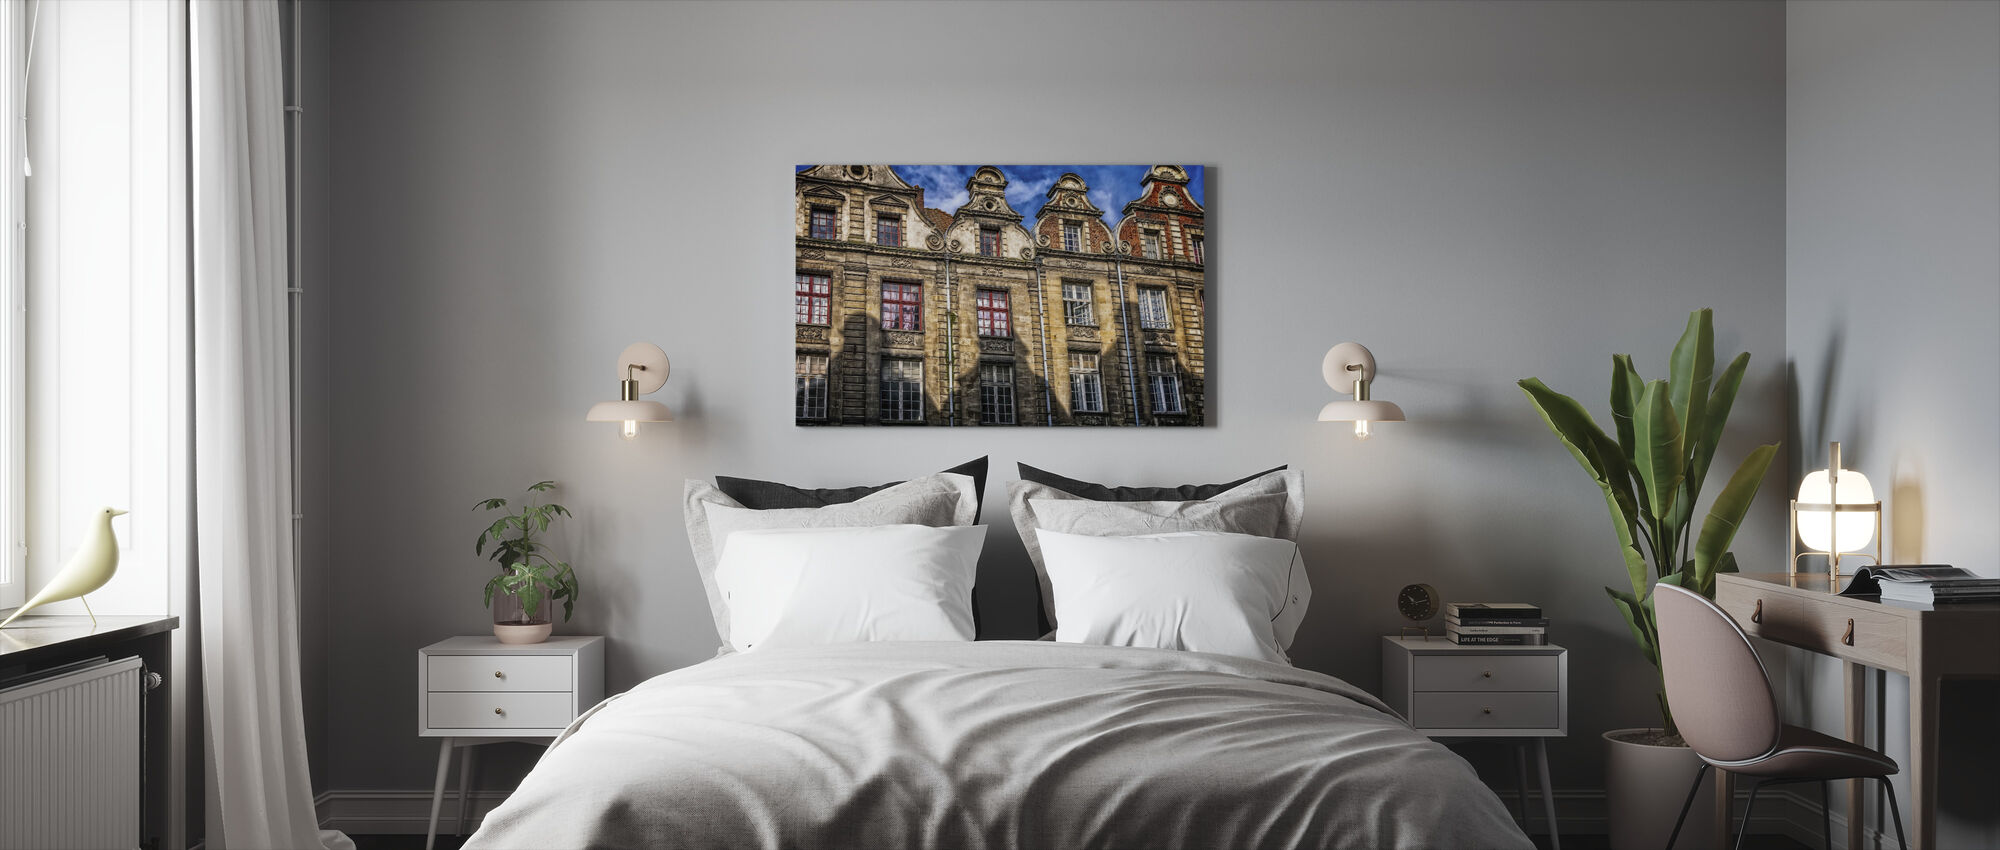 House Facade - Canvas print - Bedroom